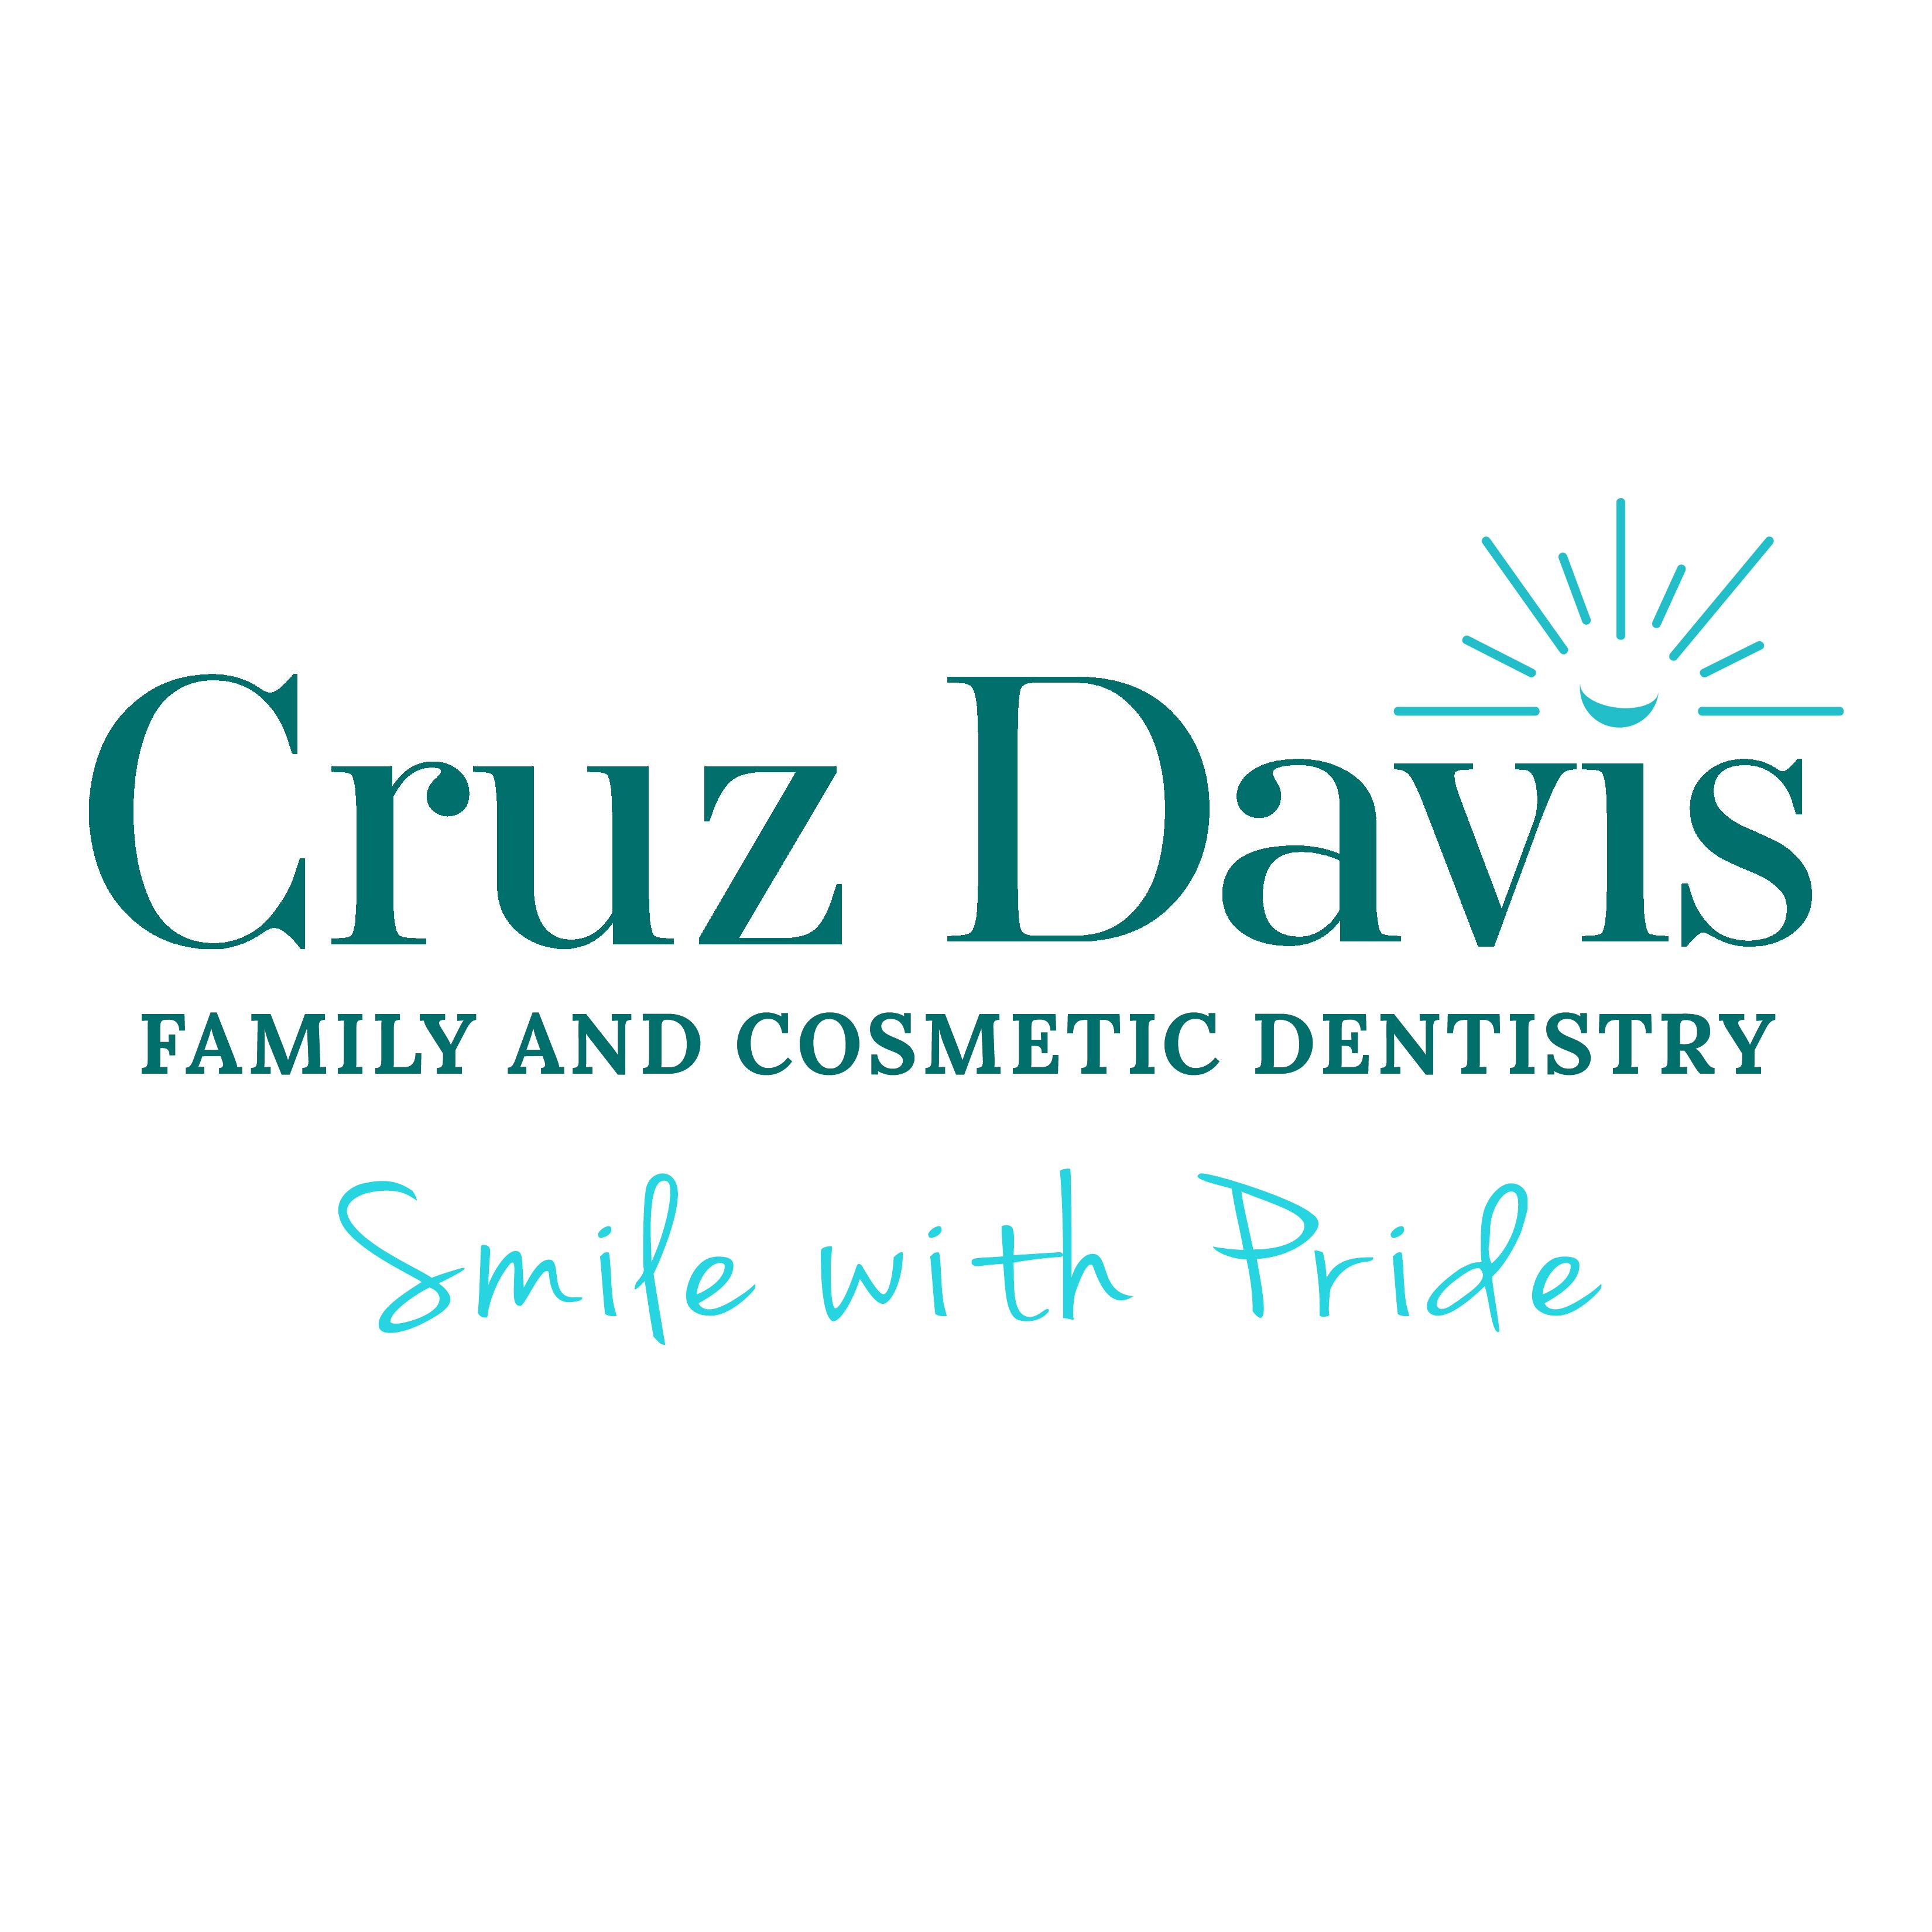 Cruz Davis Family and Cosmetic Dentistry